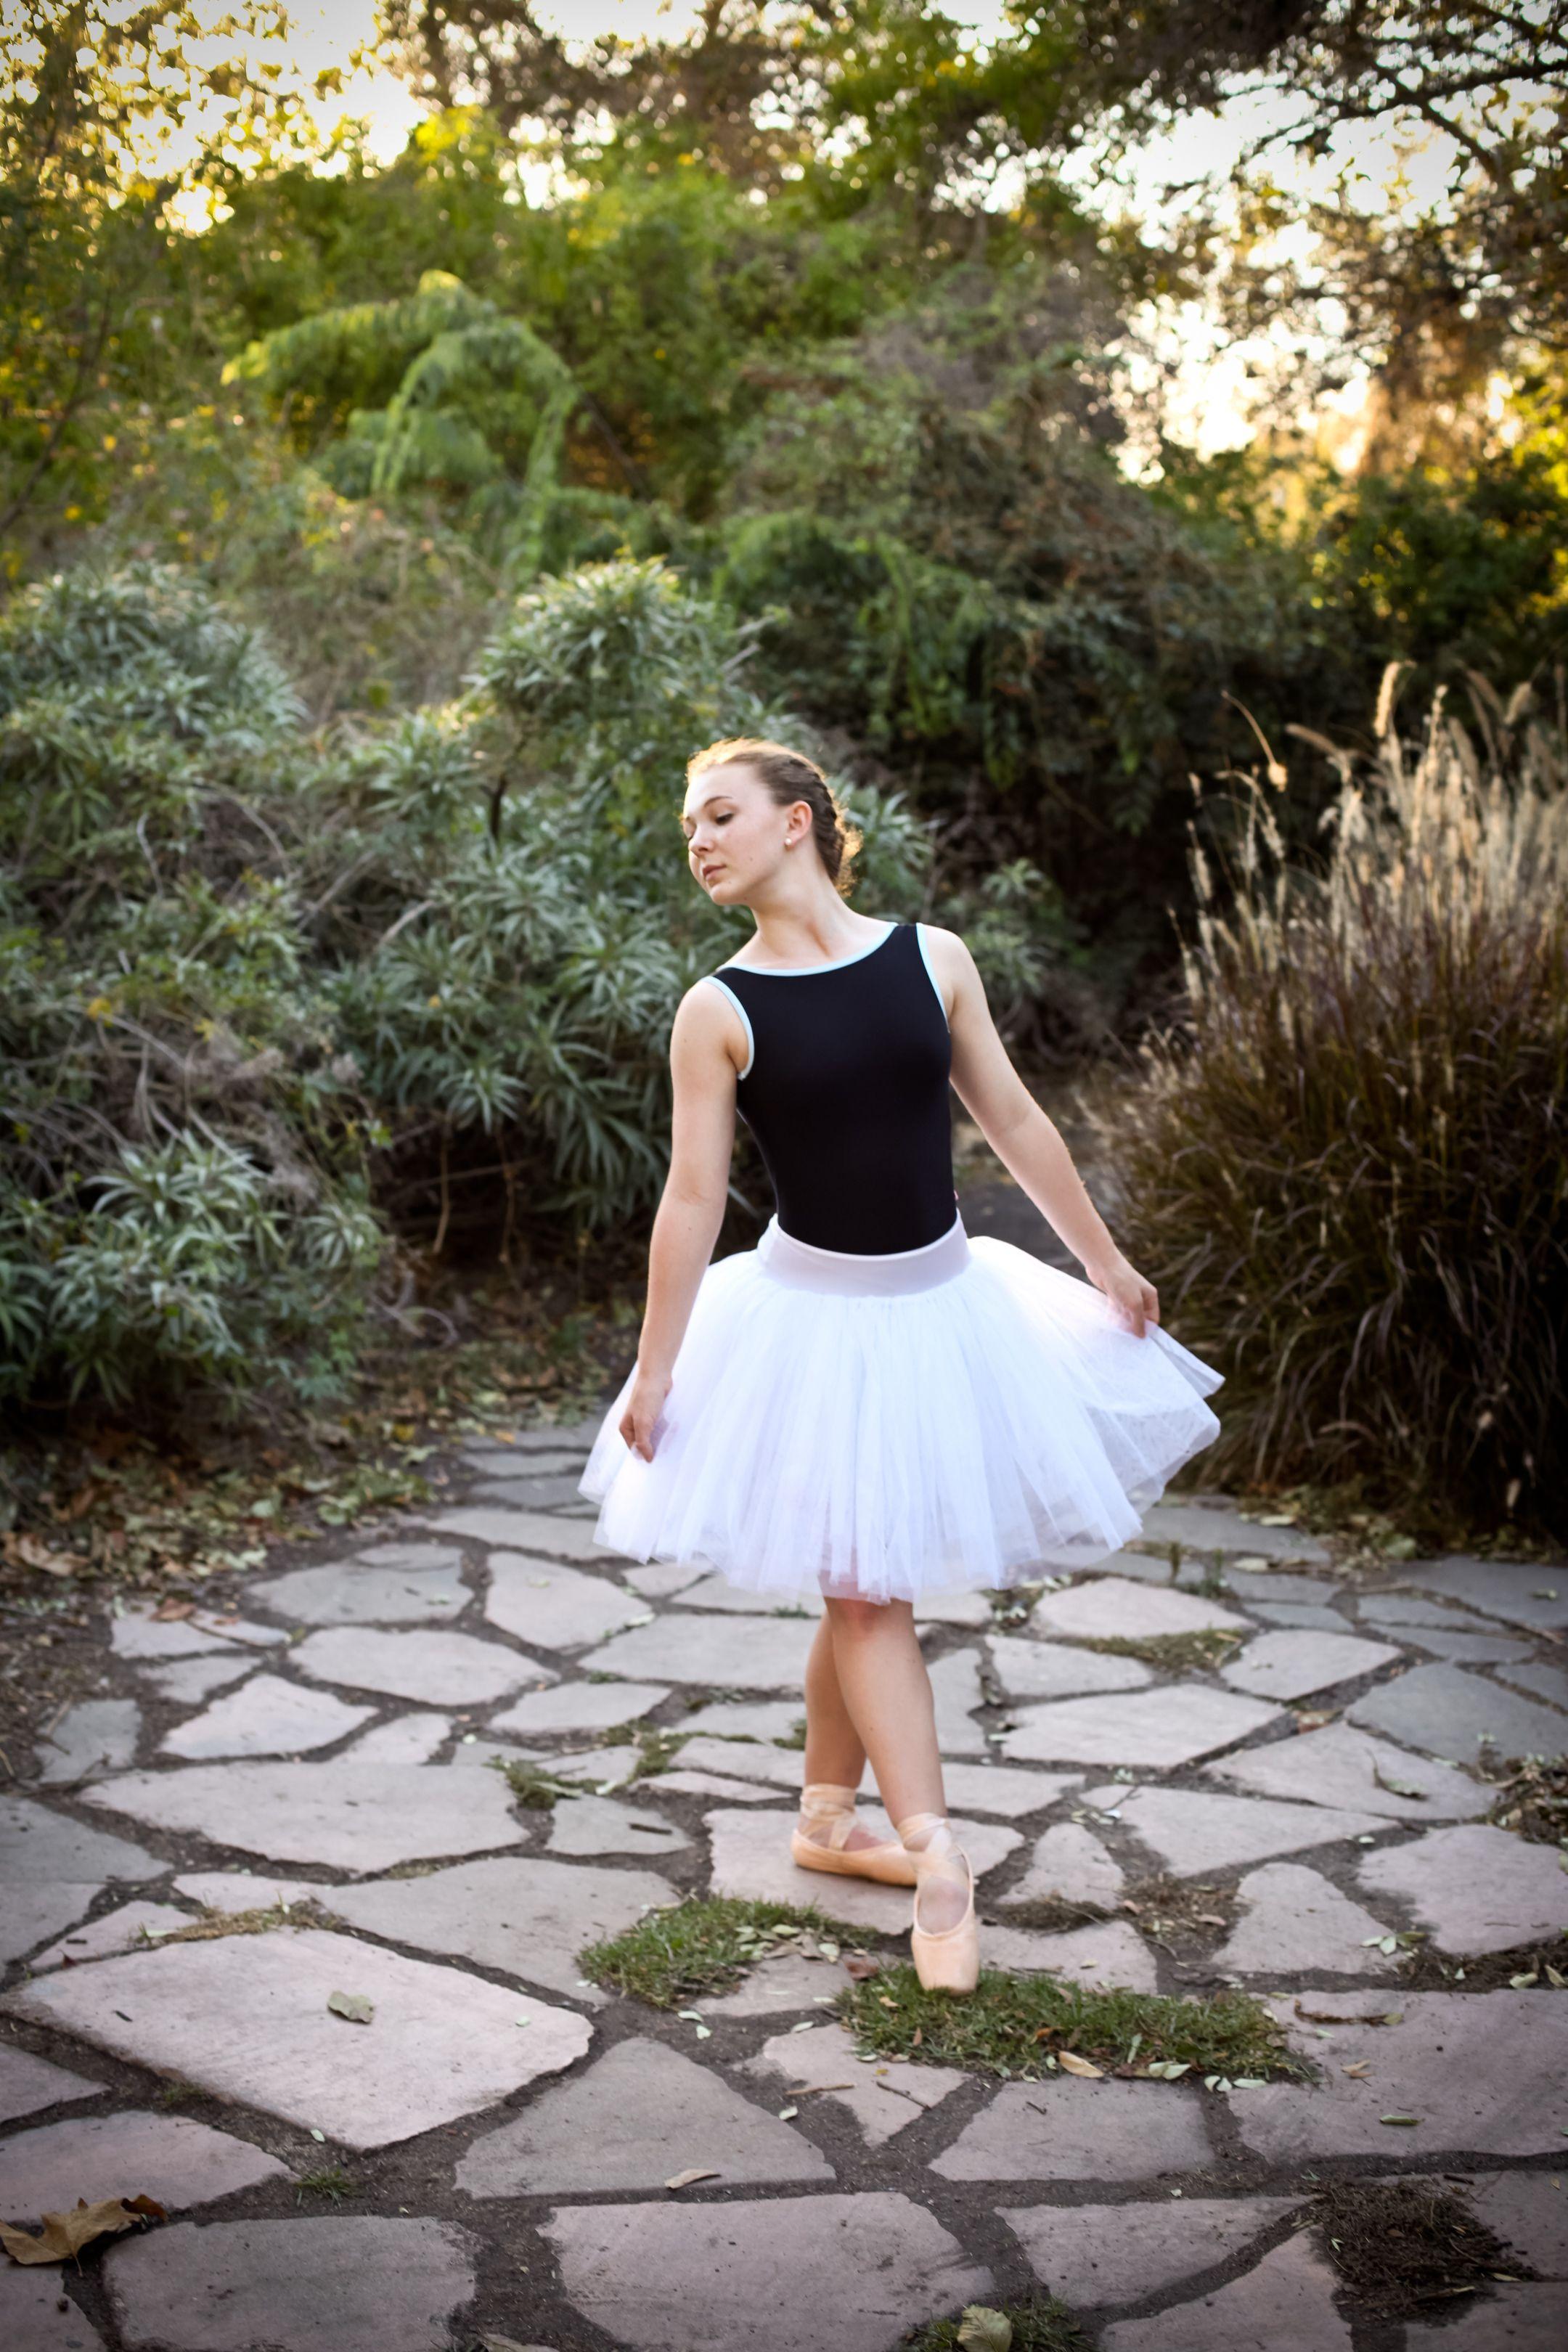 Ballerina Amy Morris Photography